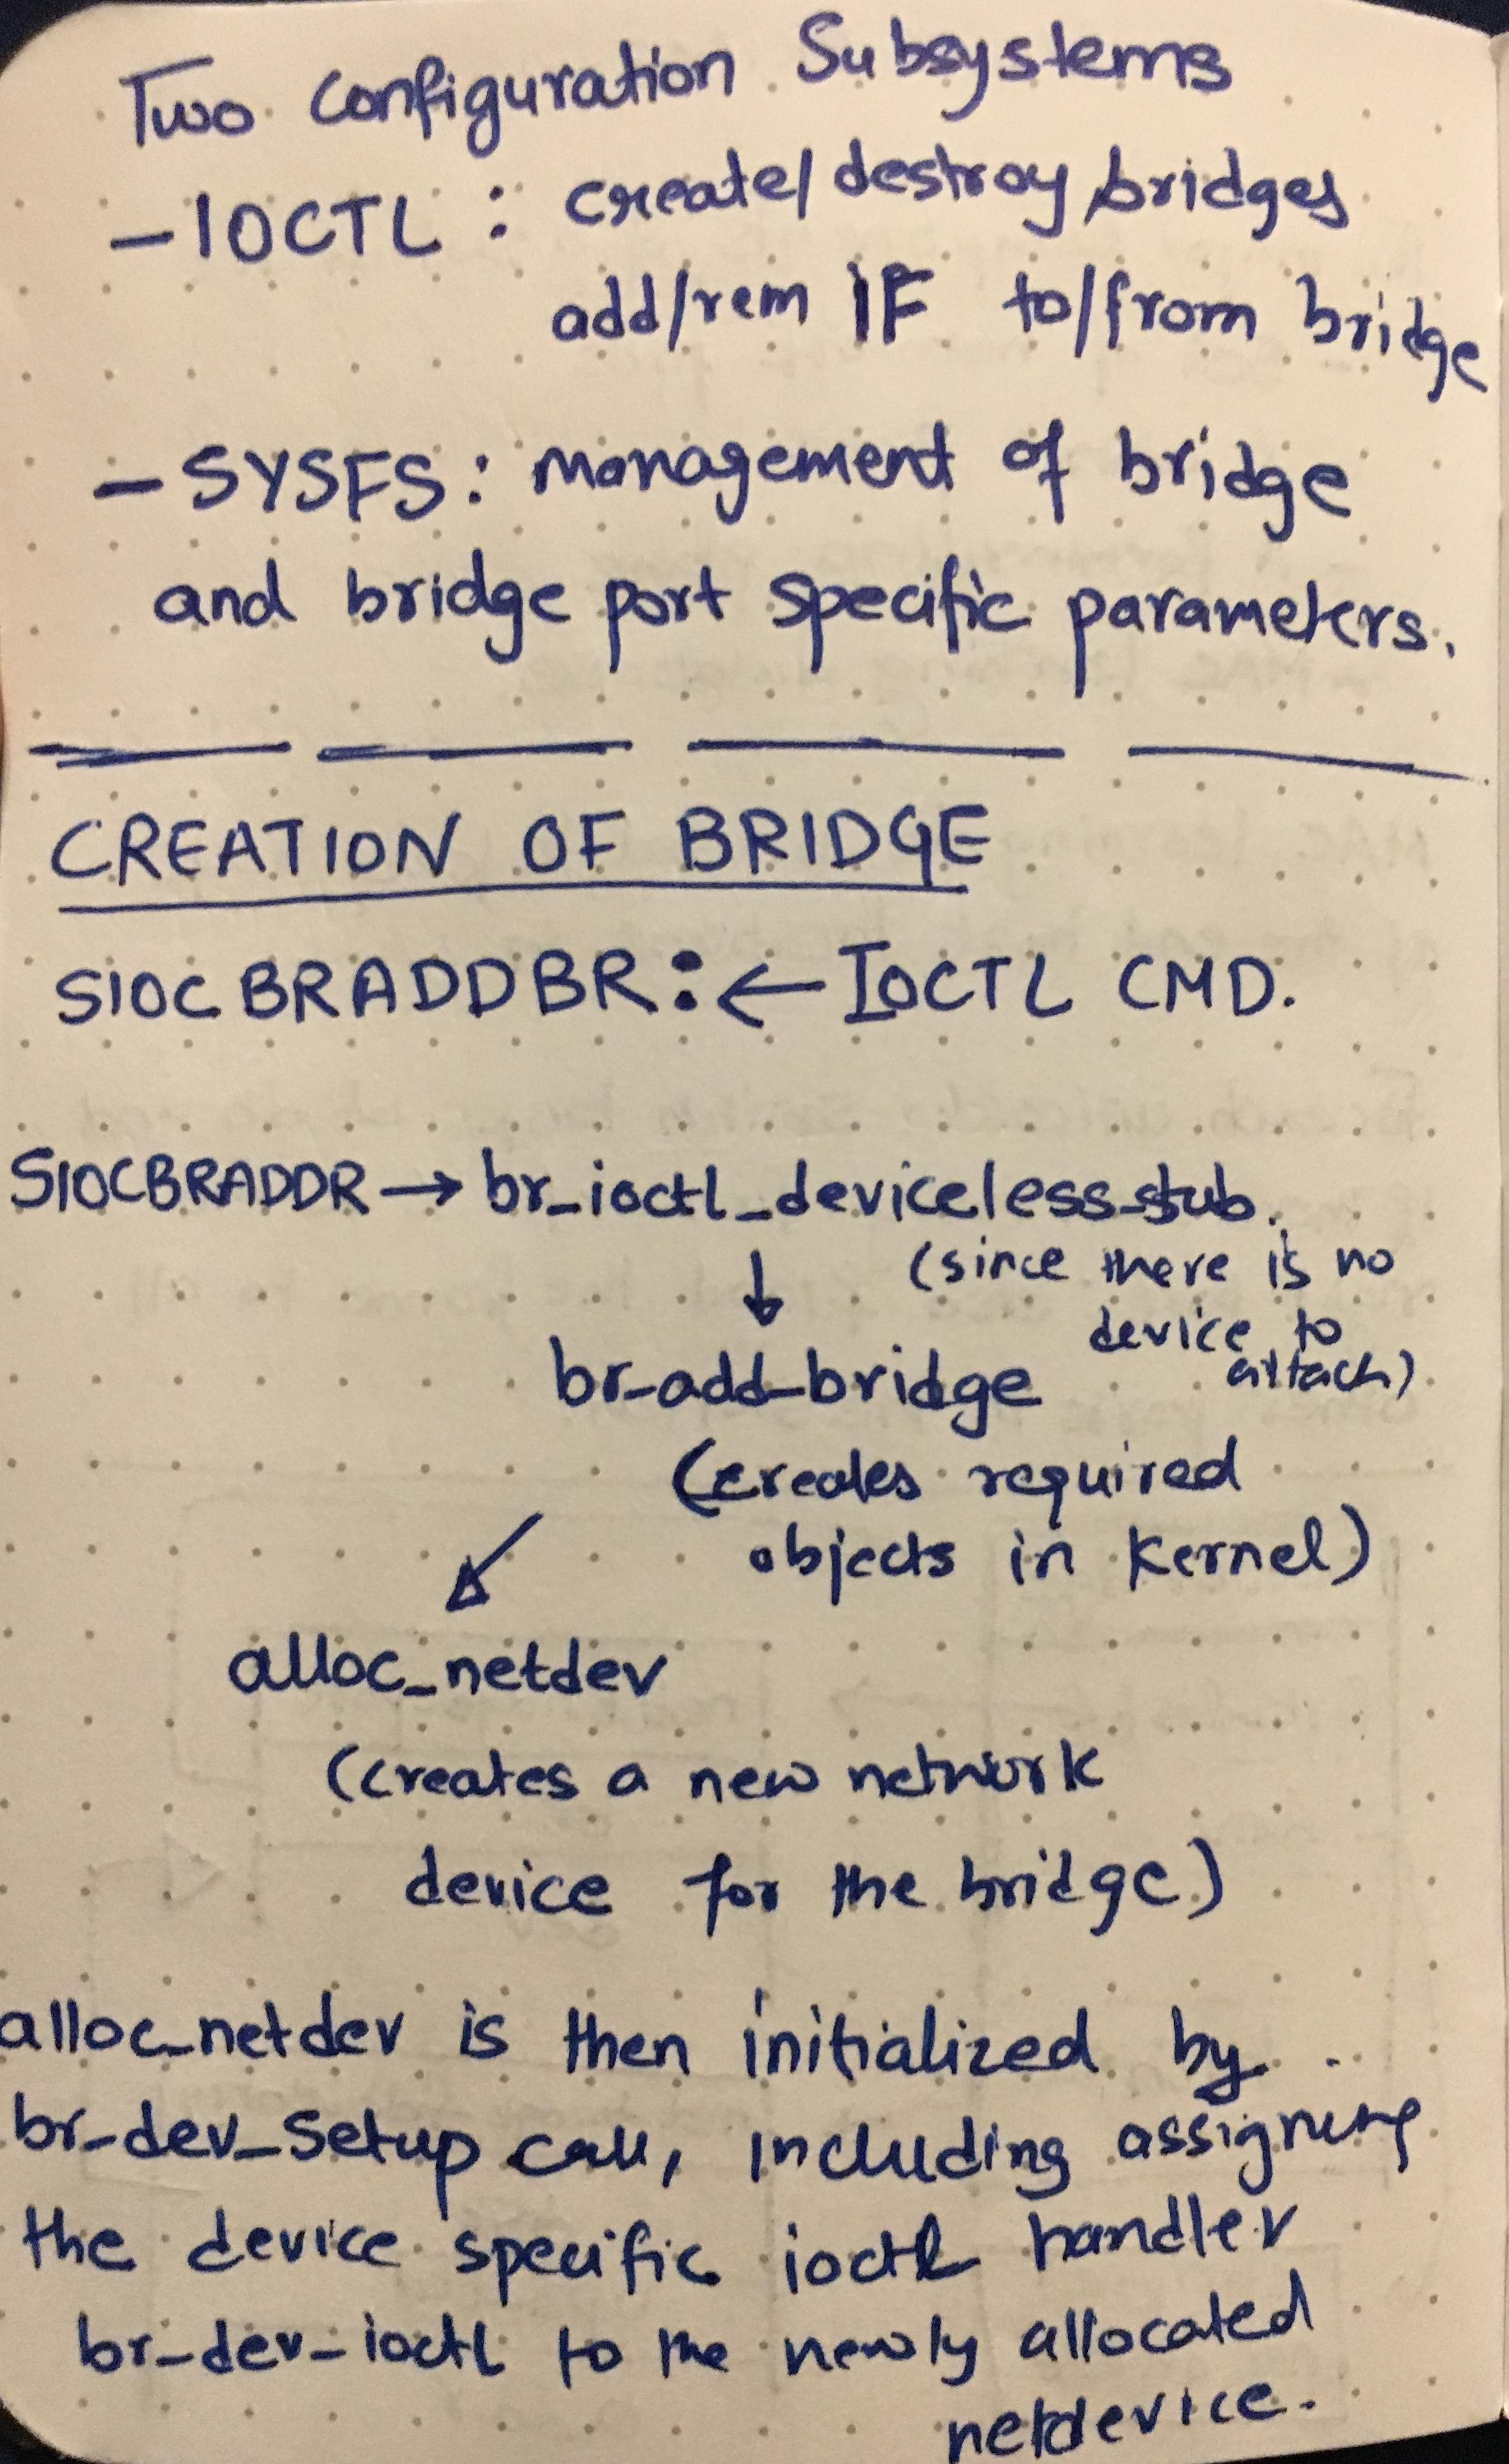 Linux Bridge 1